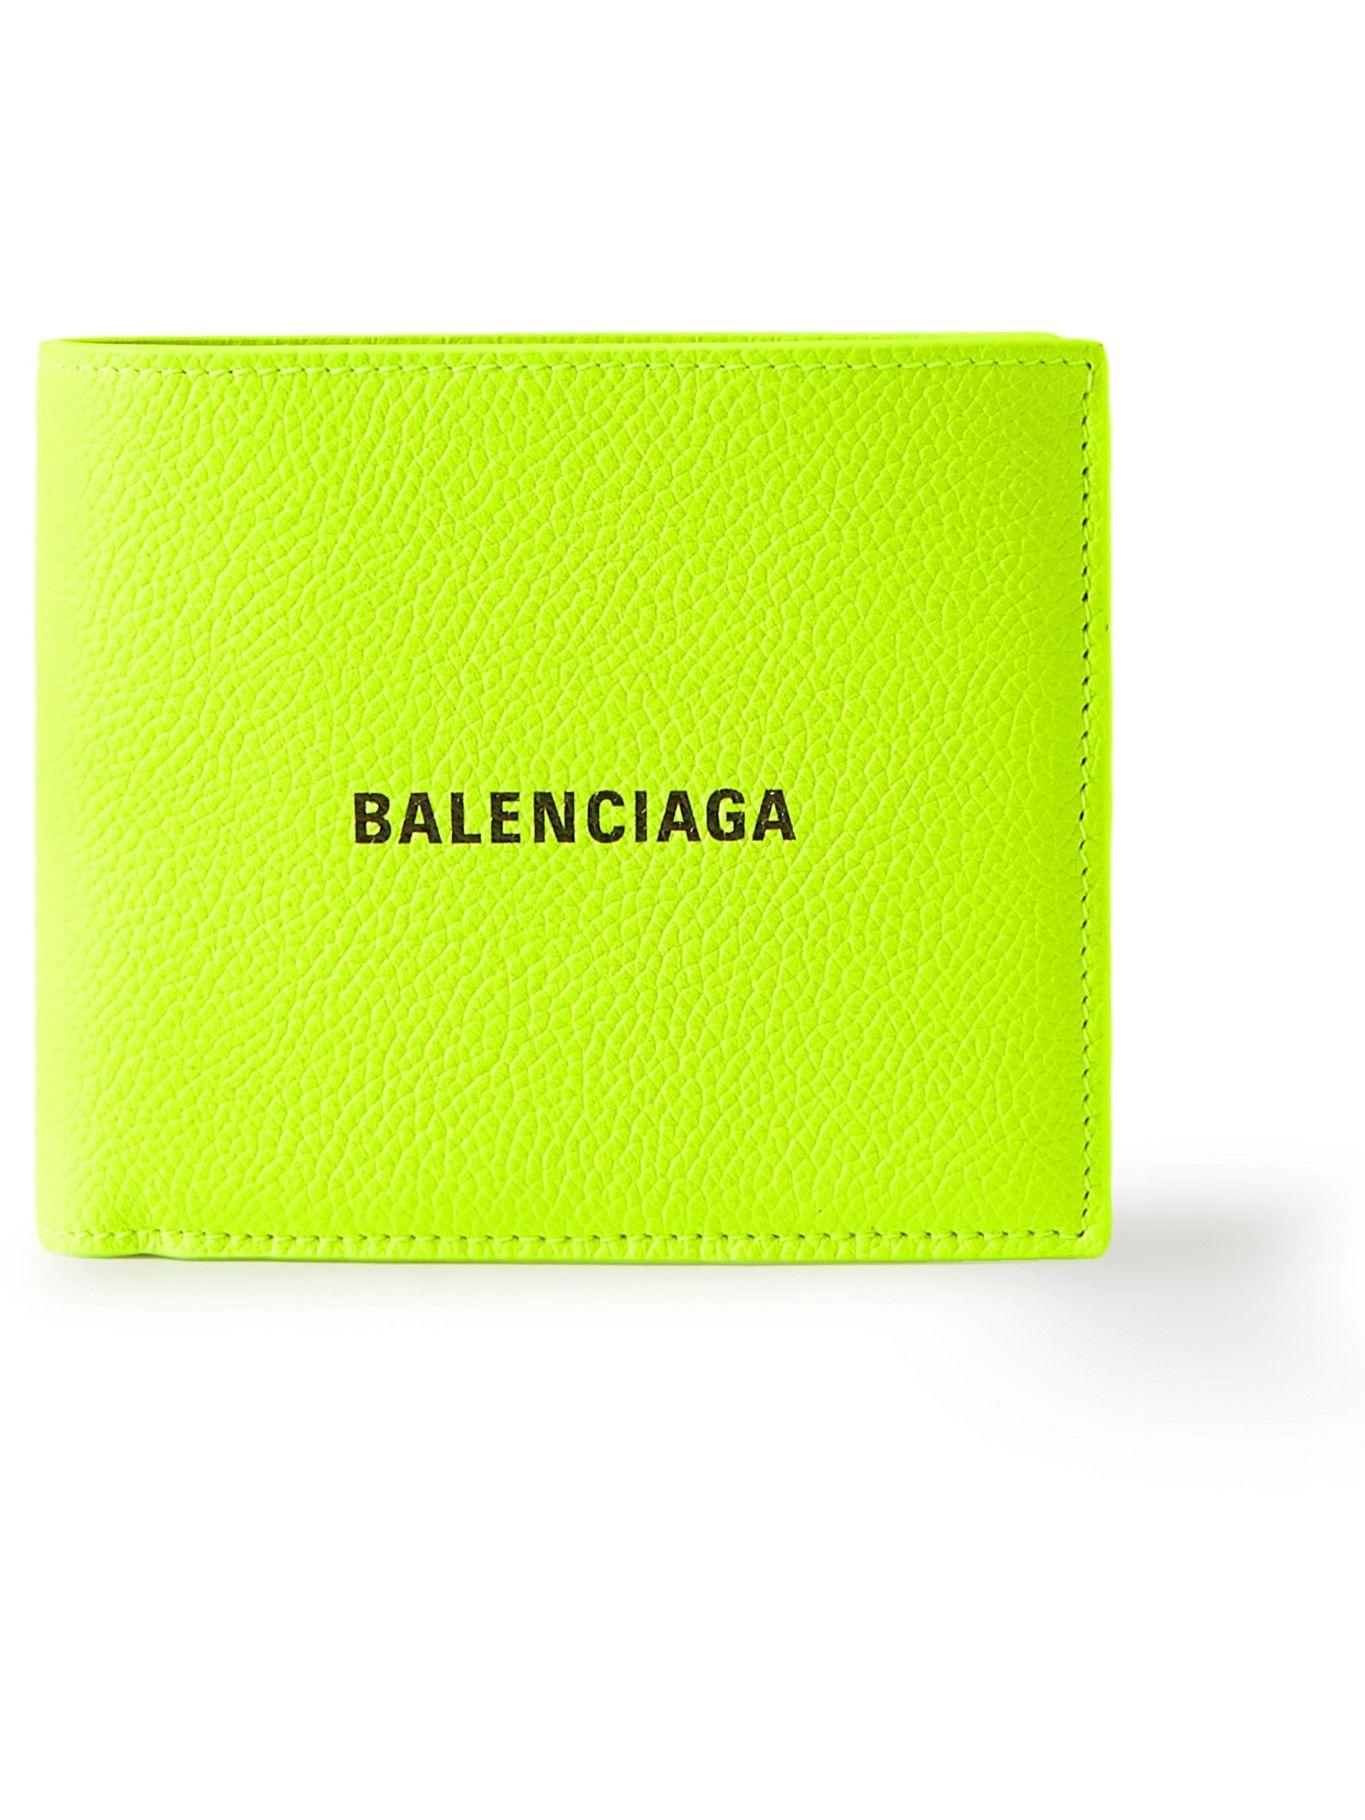 BALENCIAGA - Logo-Print Full-Grain Leather Billfold Wallet